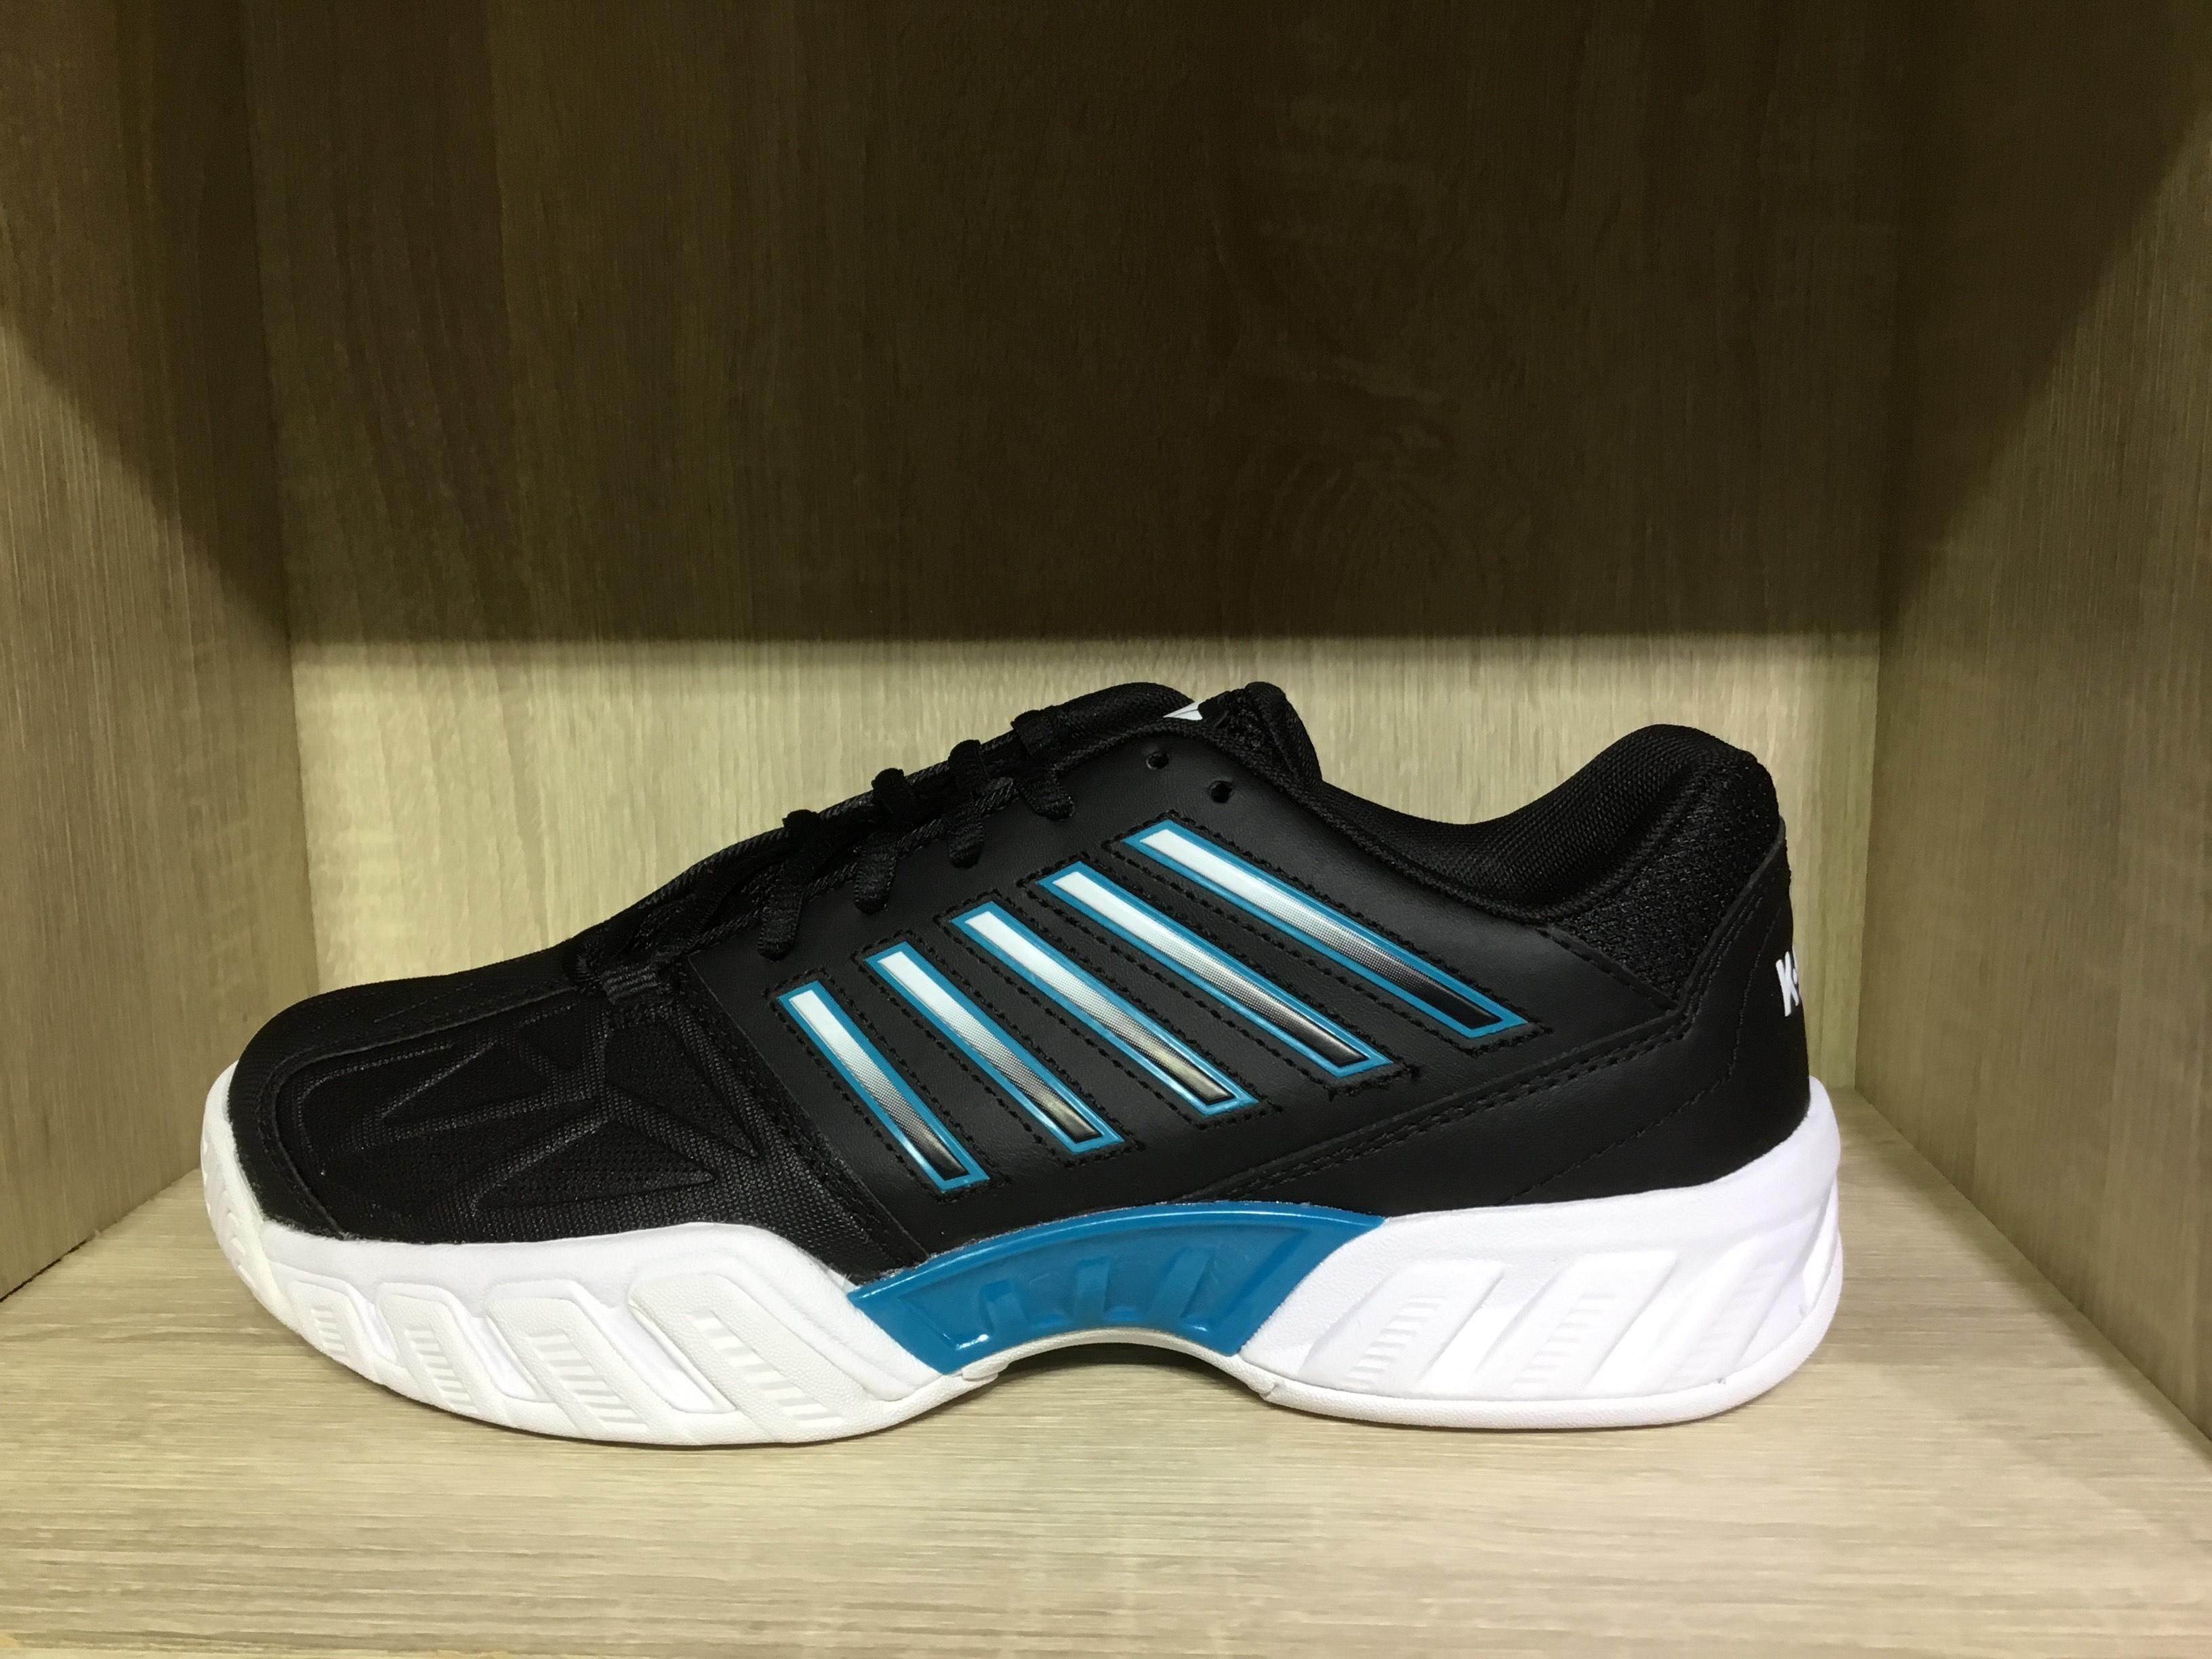 2020年K-SWISS Bigshot Light 3 專業男網球鞋